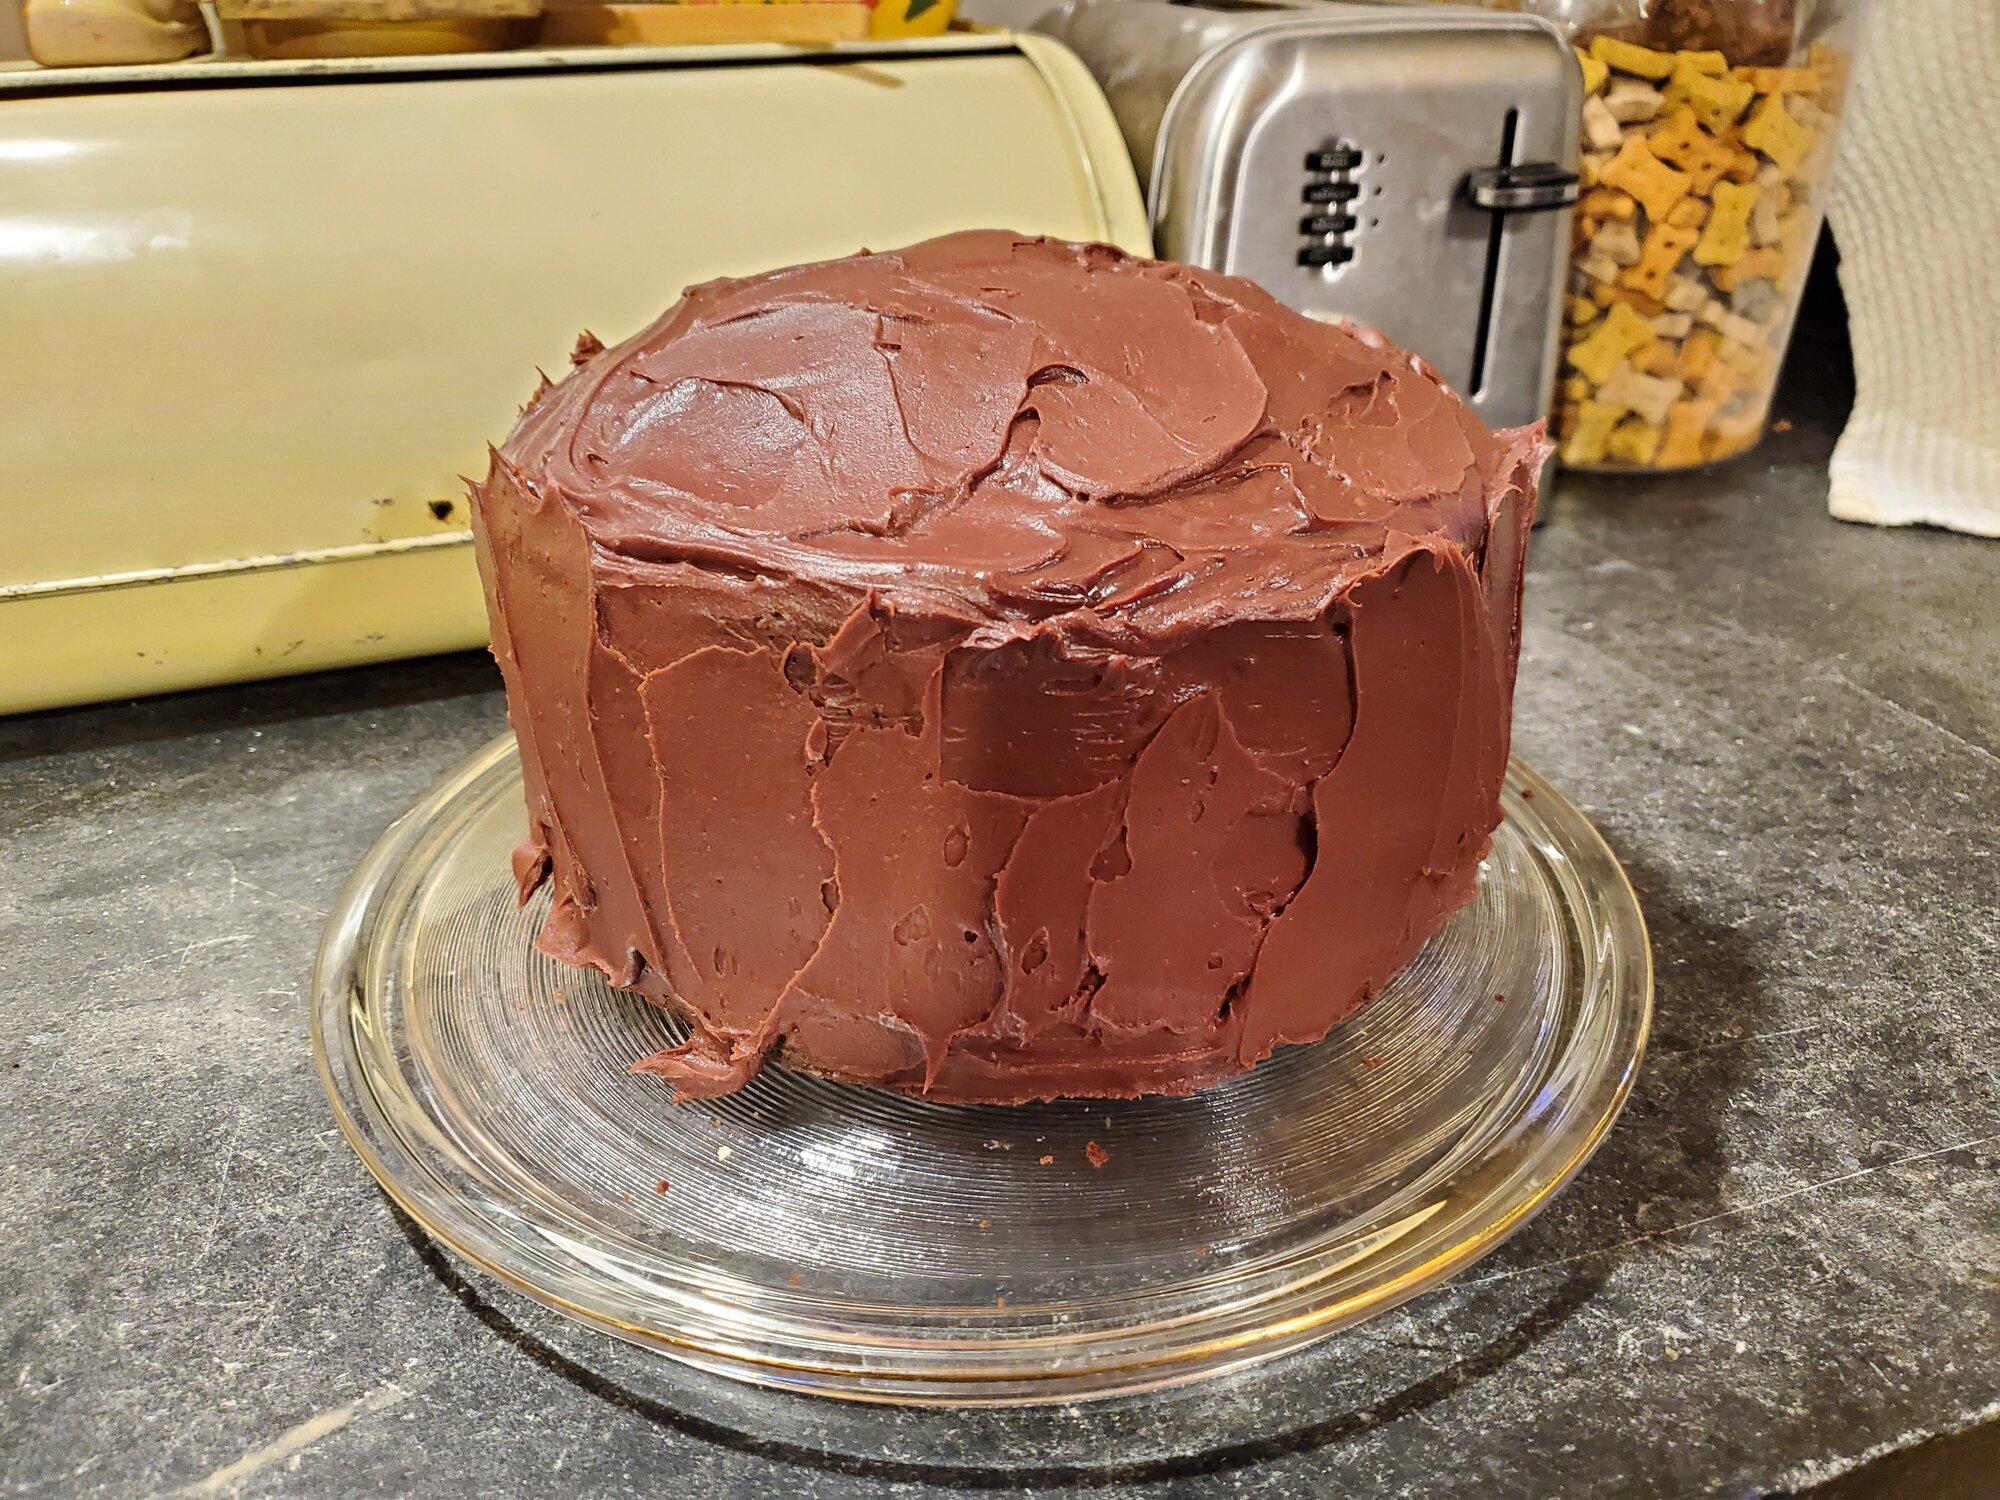 chocolatestoutcake.jpg